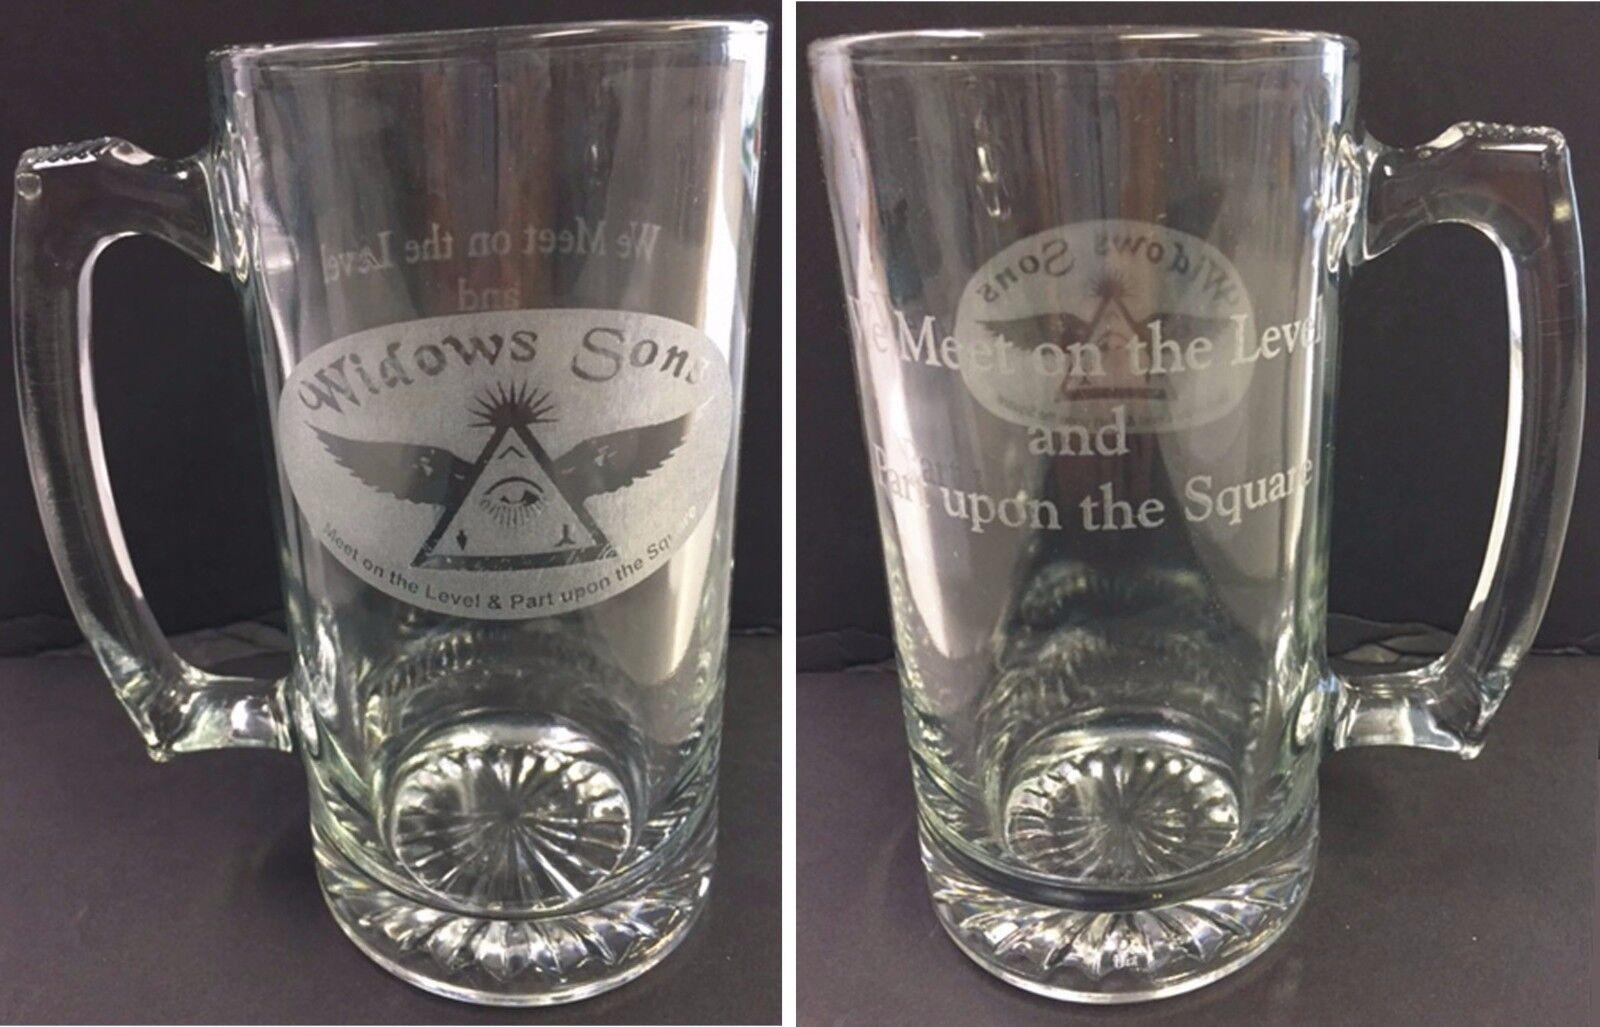 b8d94fcc8 Laser Engraved Masonic Widows Sons 25 oz Sports Mug with saying on ...